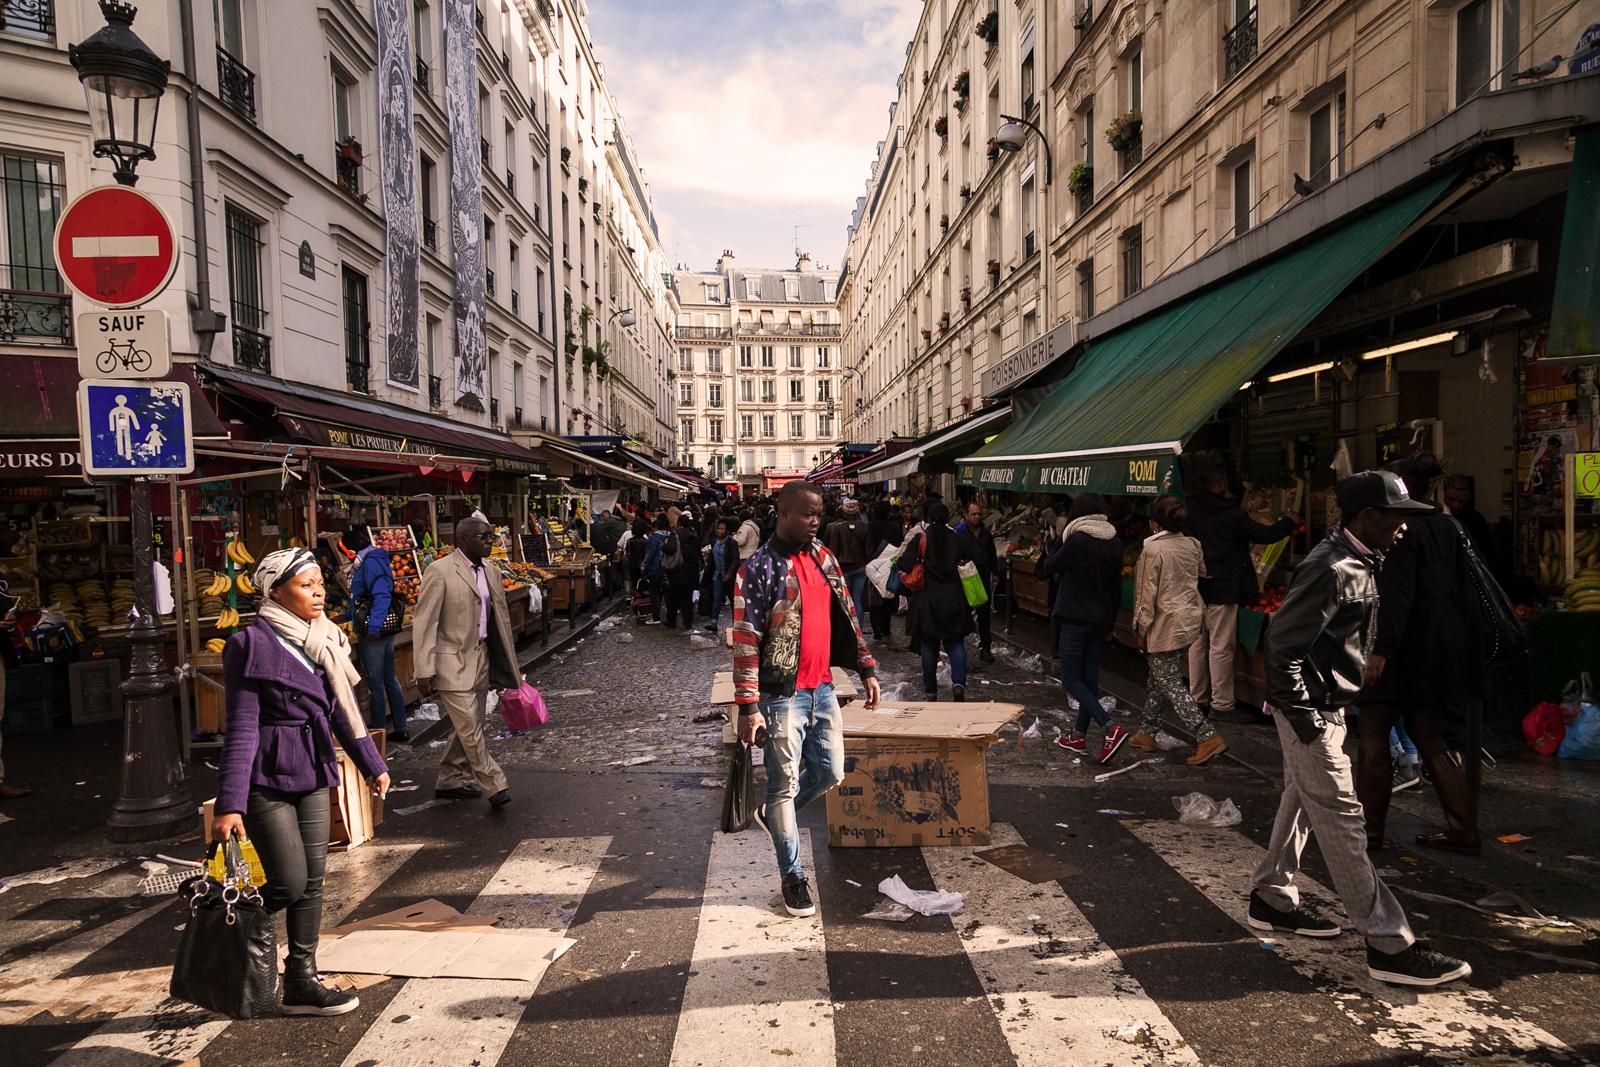 Traditional street market at Rue Dejean.